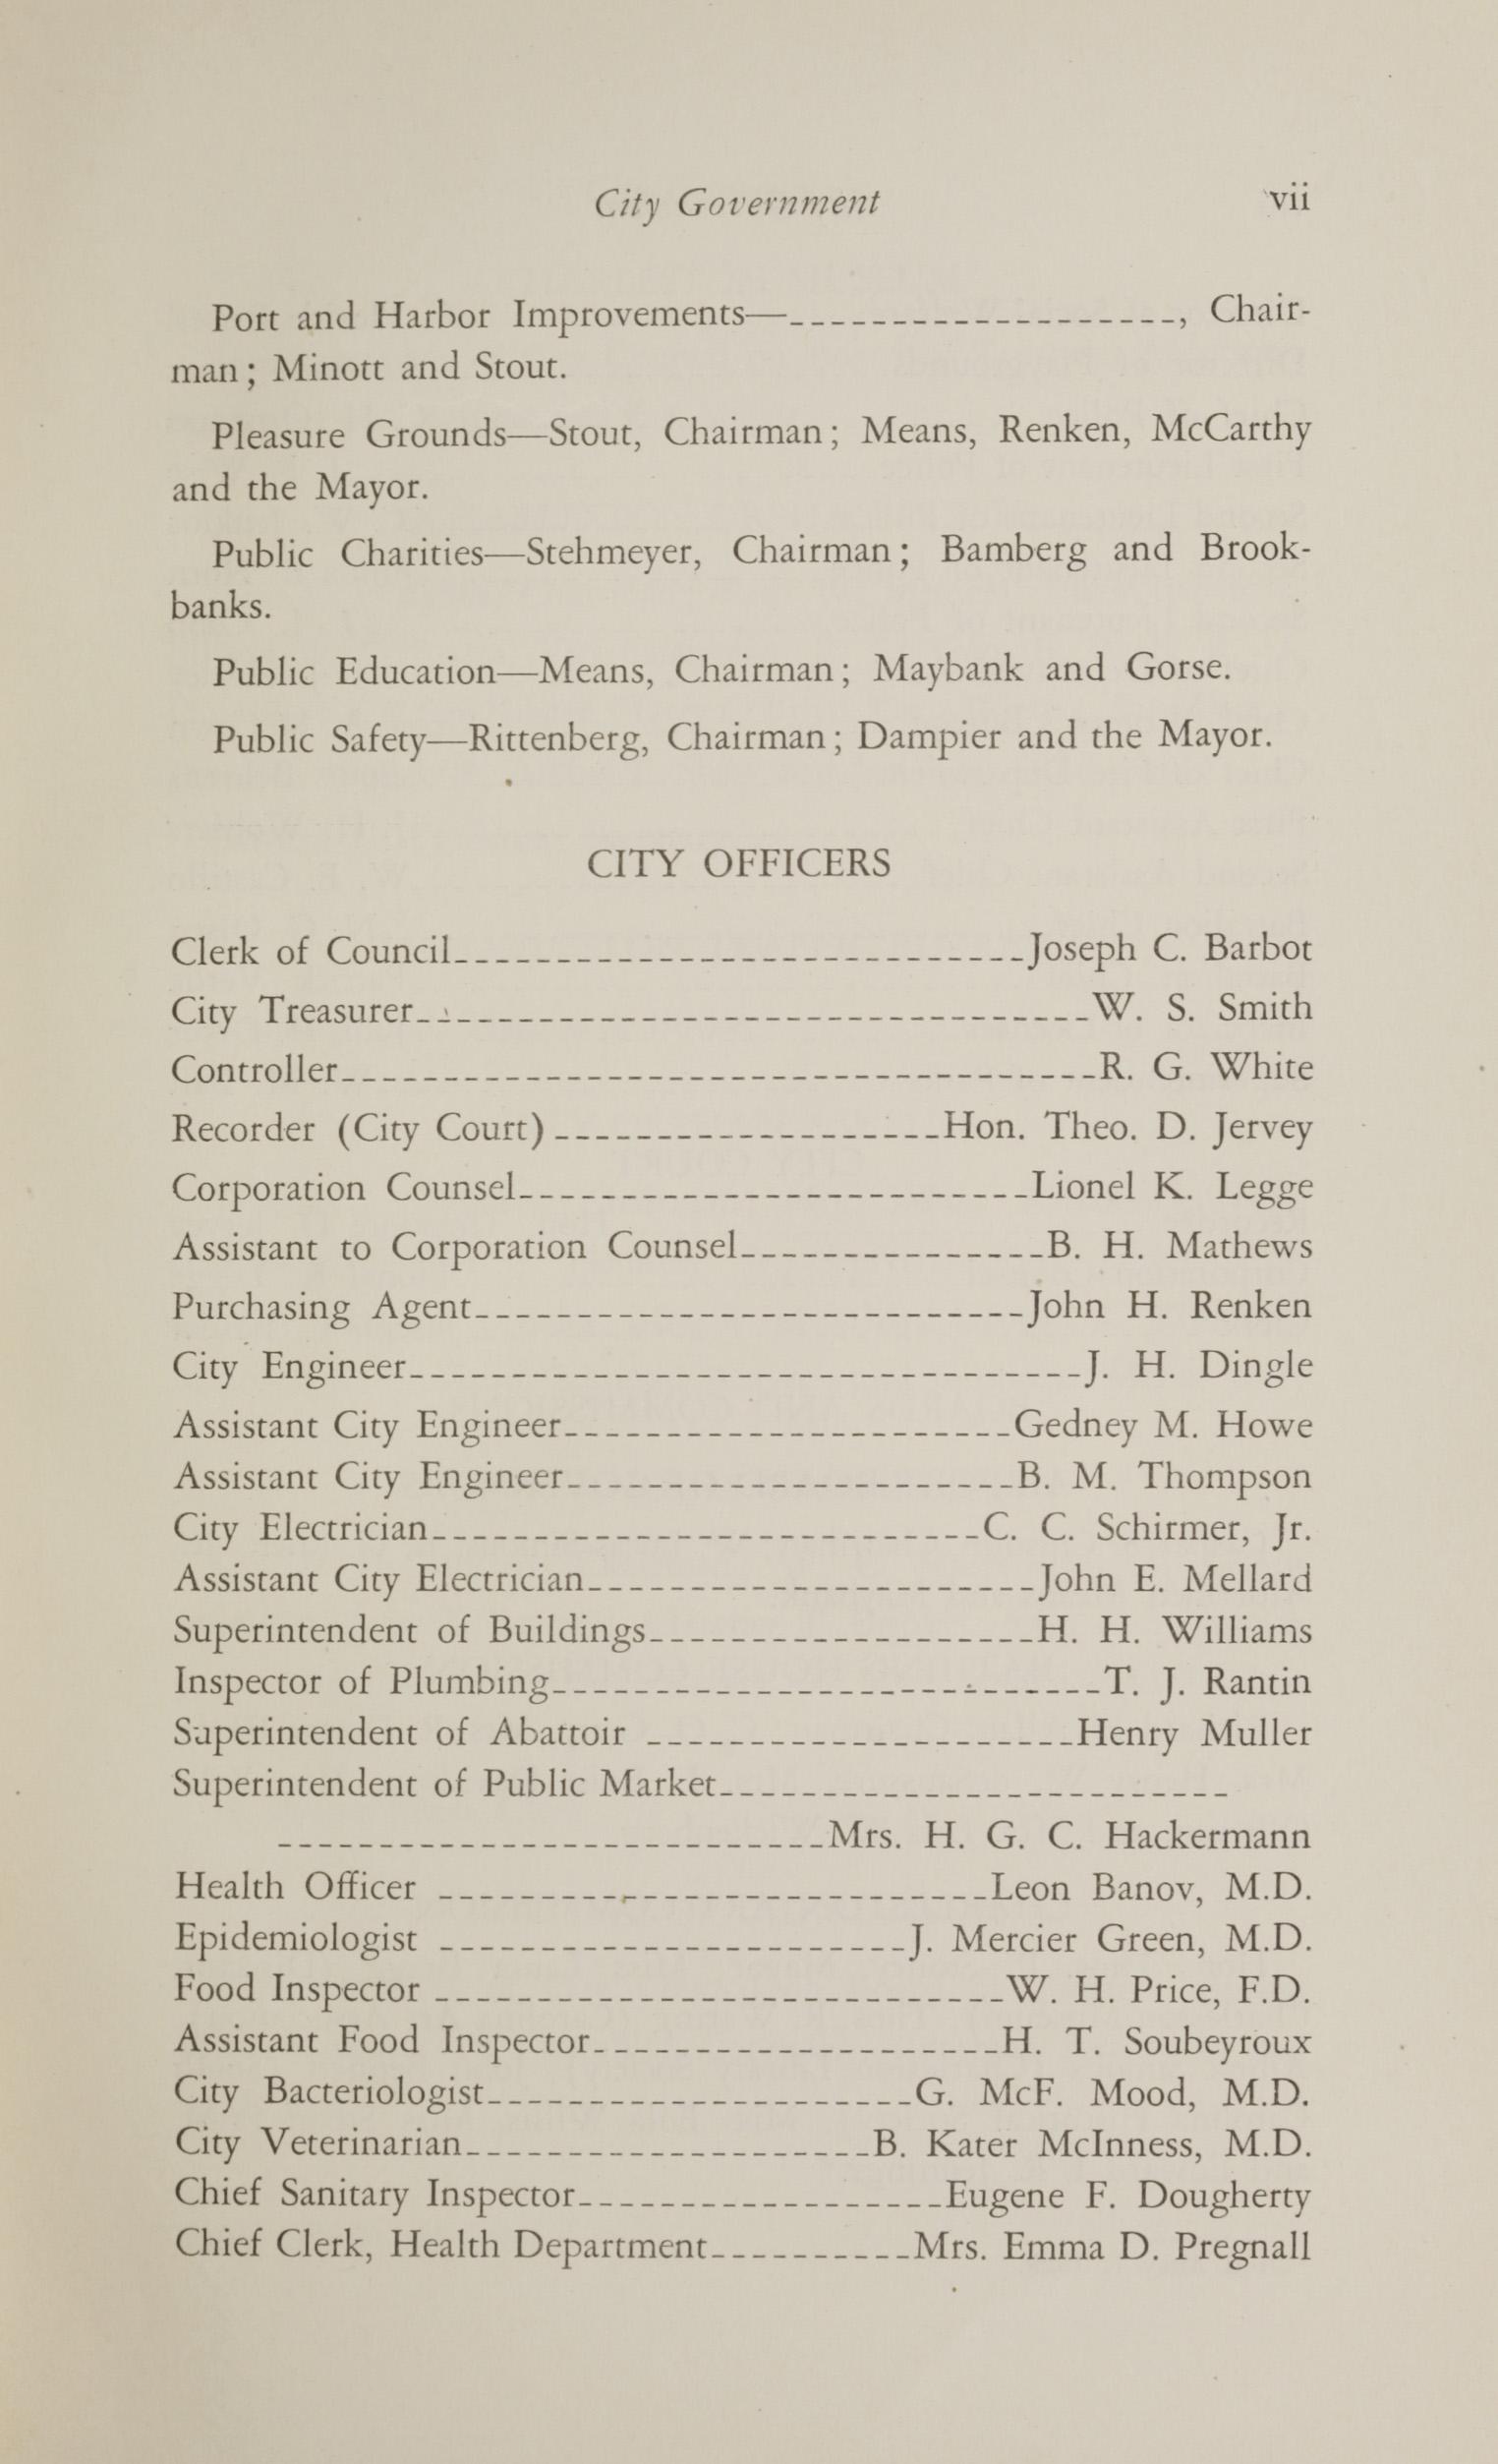 Charleston Yearbook, 1930, page vii